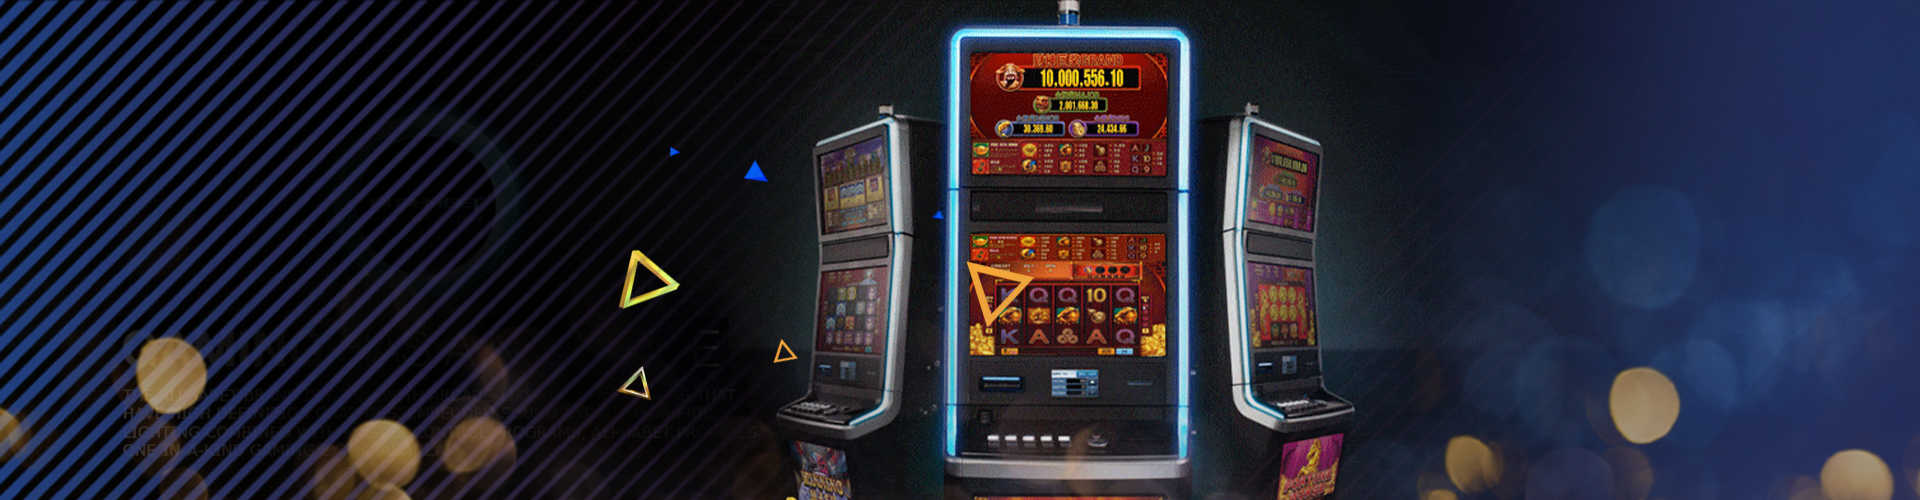 Online Casino Operator